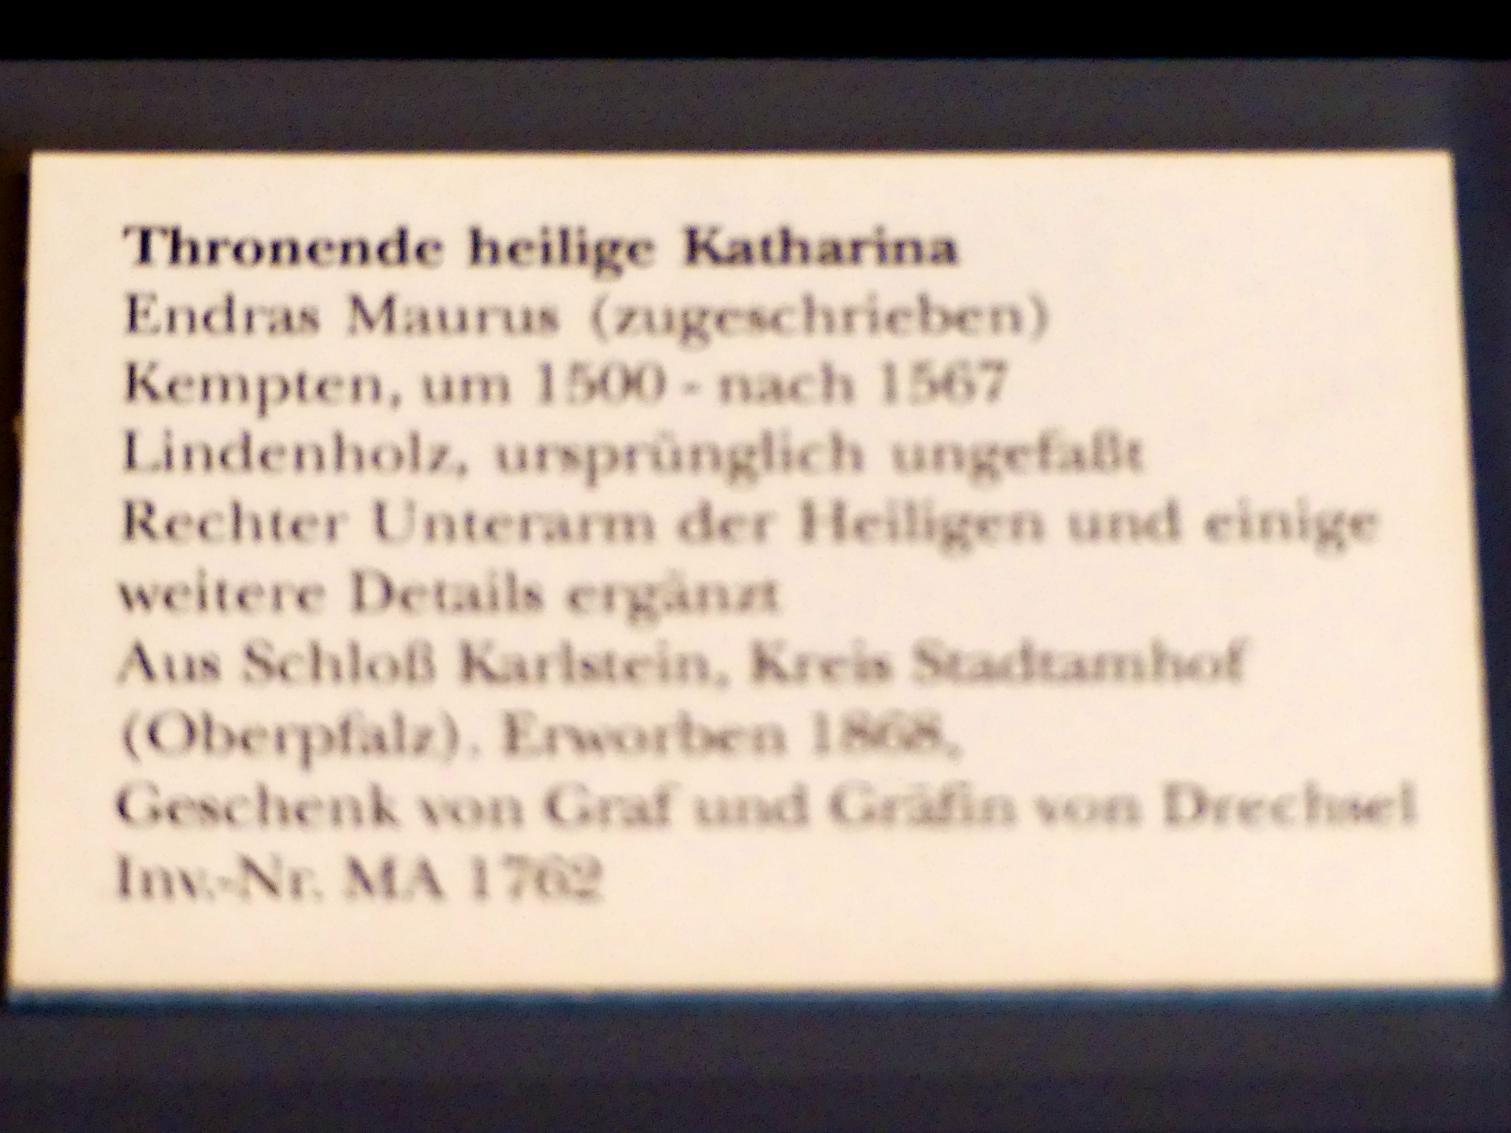 Endras Maurus: Thronende heilige Katharina, Undatiert